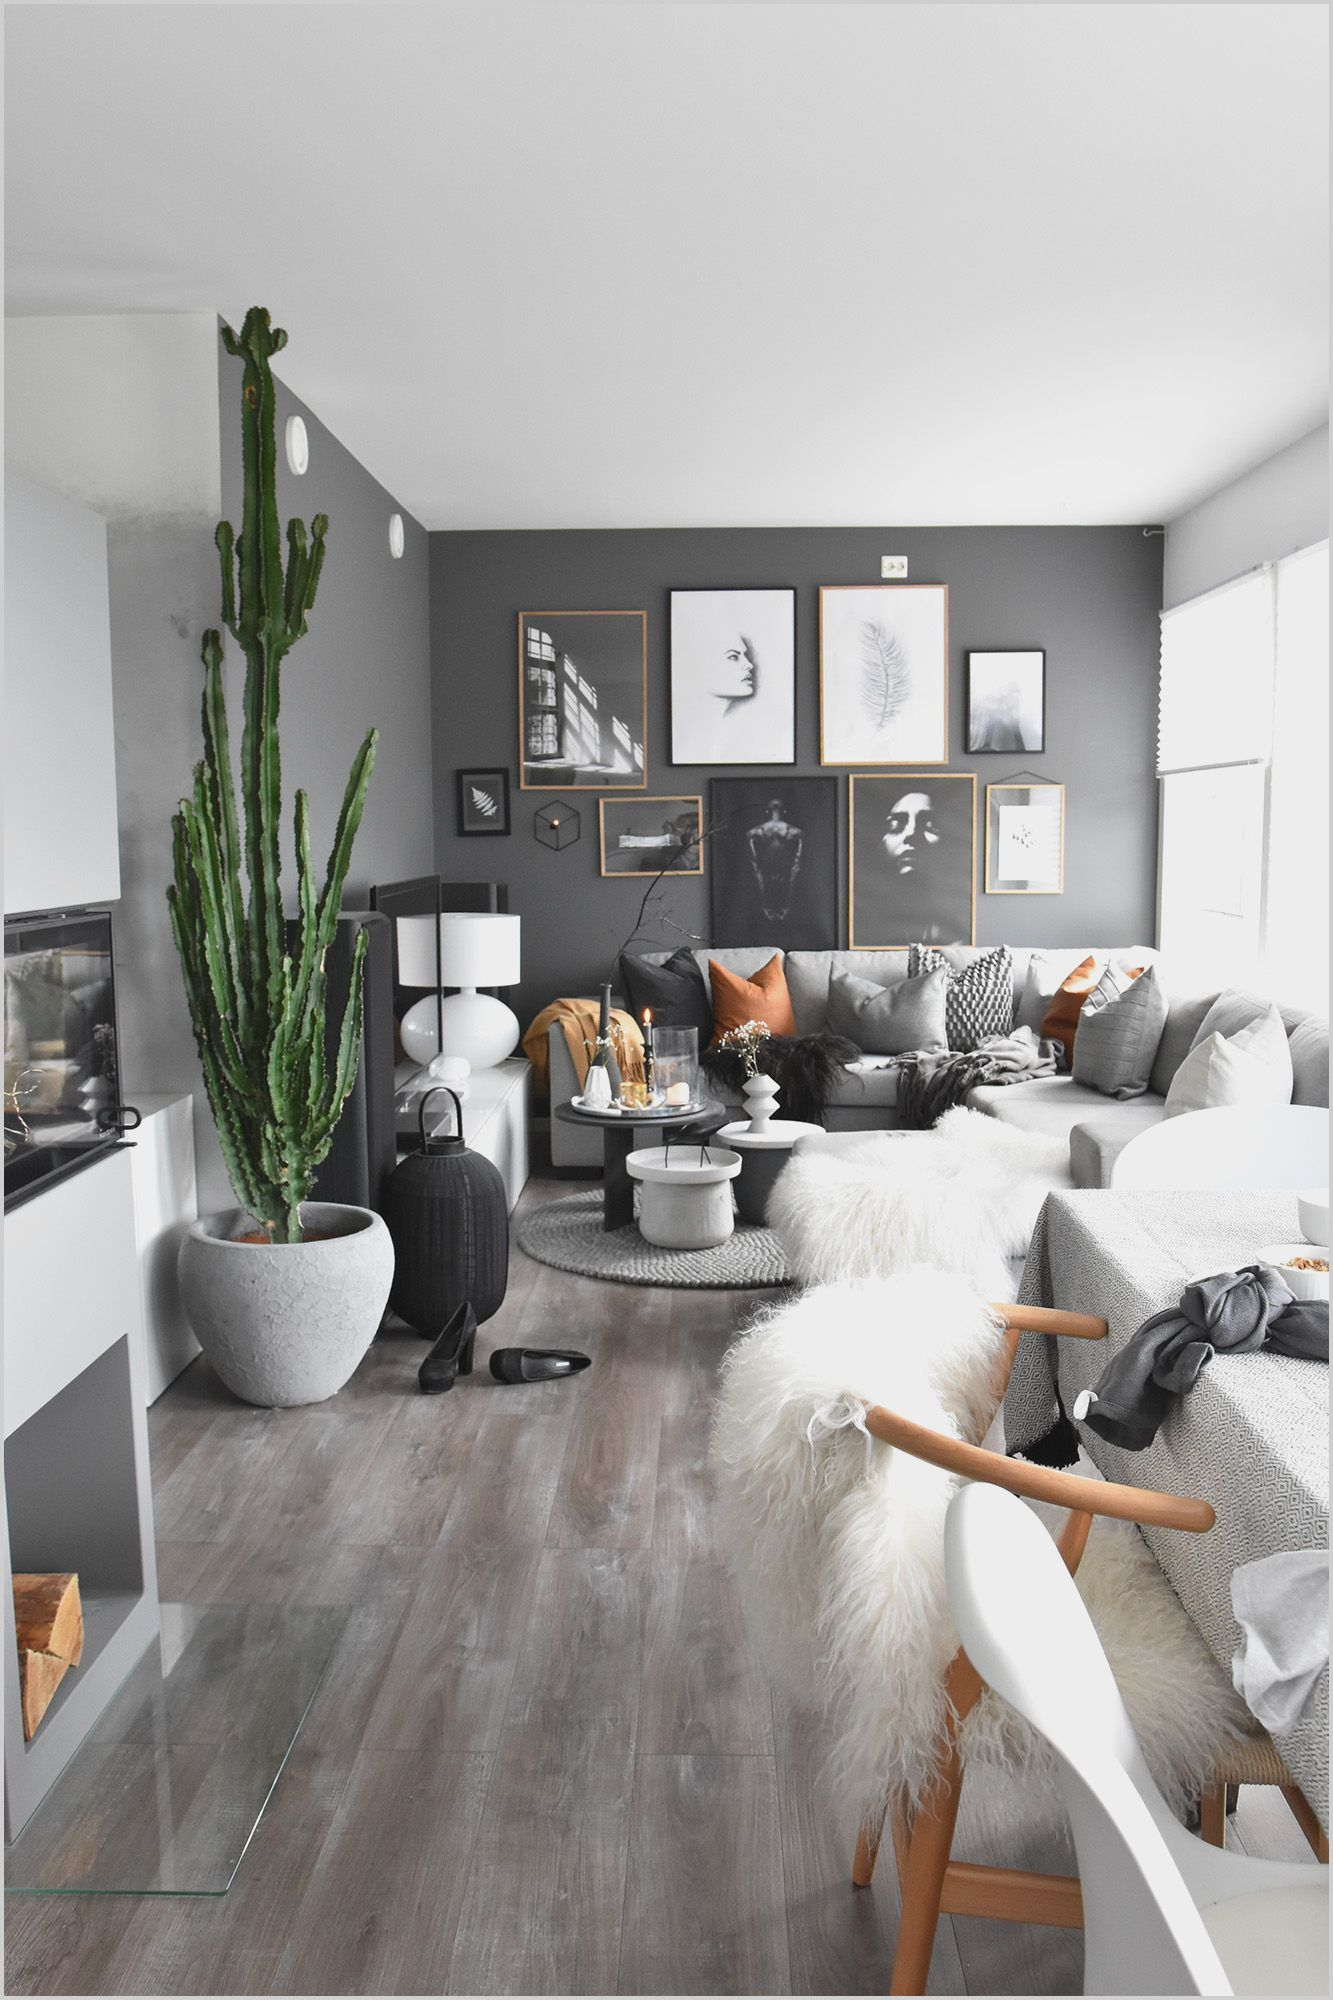 Living Room Decor With Light Gray Walls Modern Grey Living Room Black Living Room Decor Black Walls Living Room